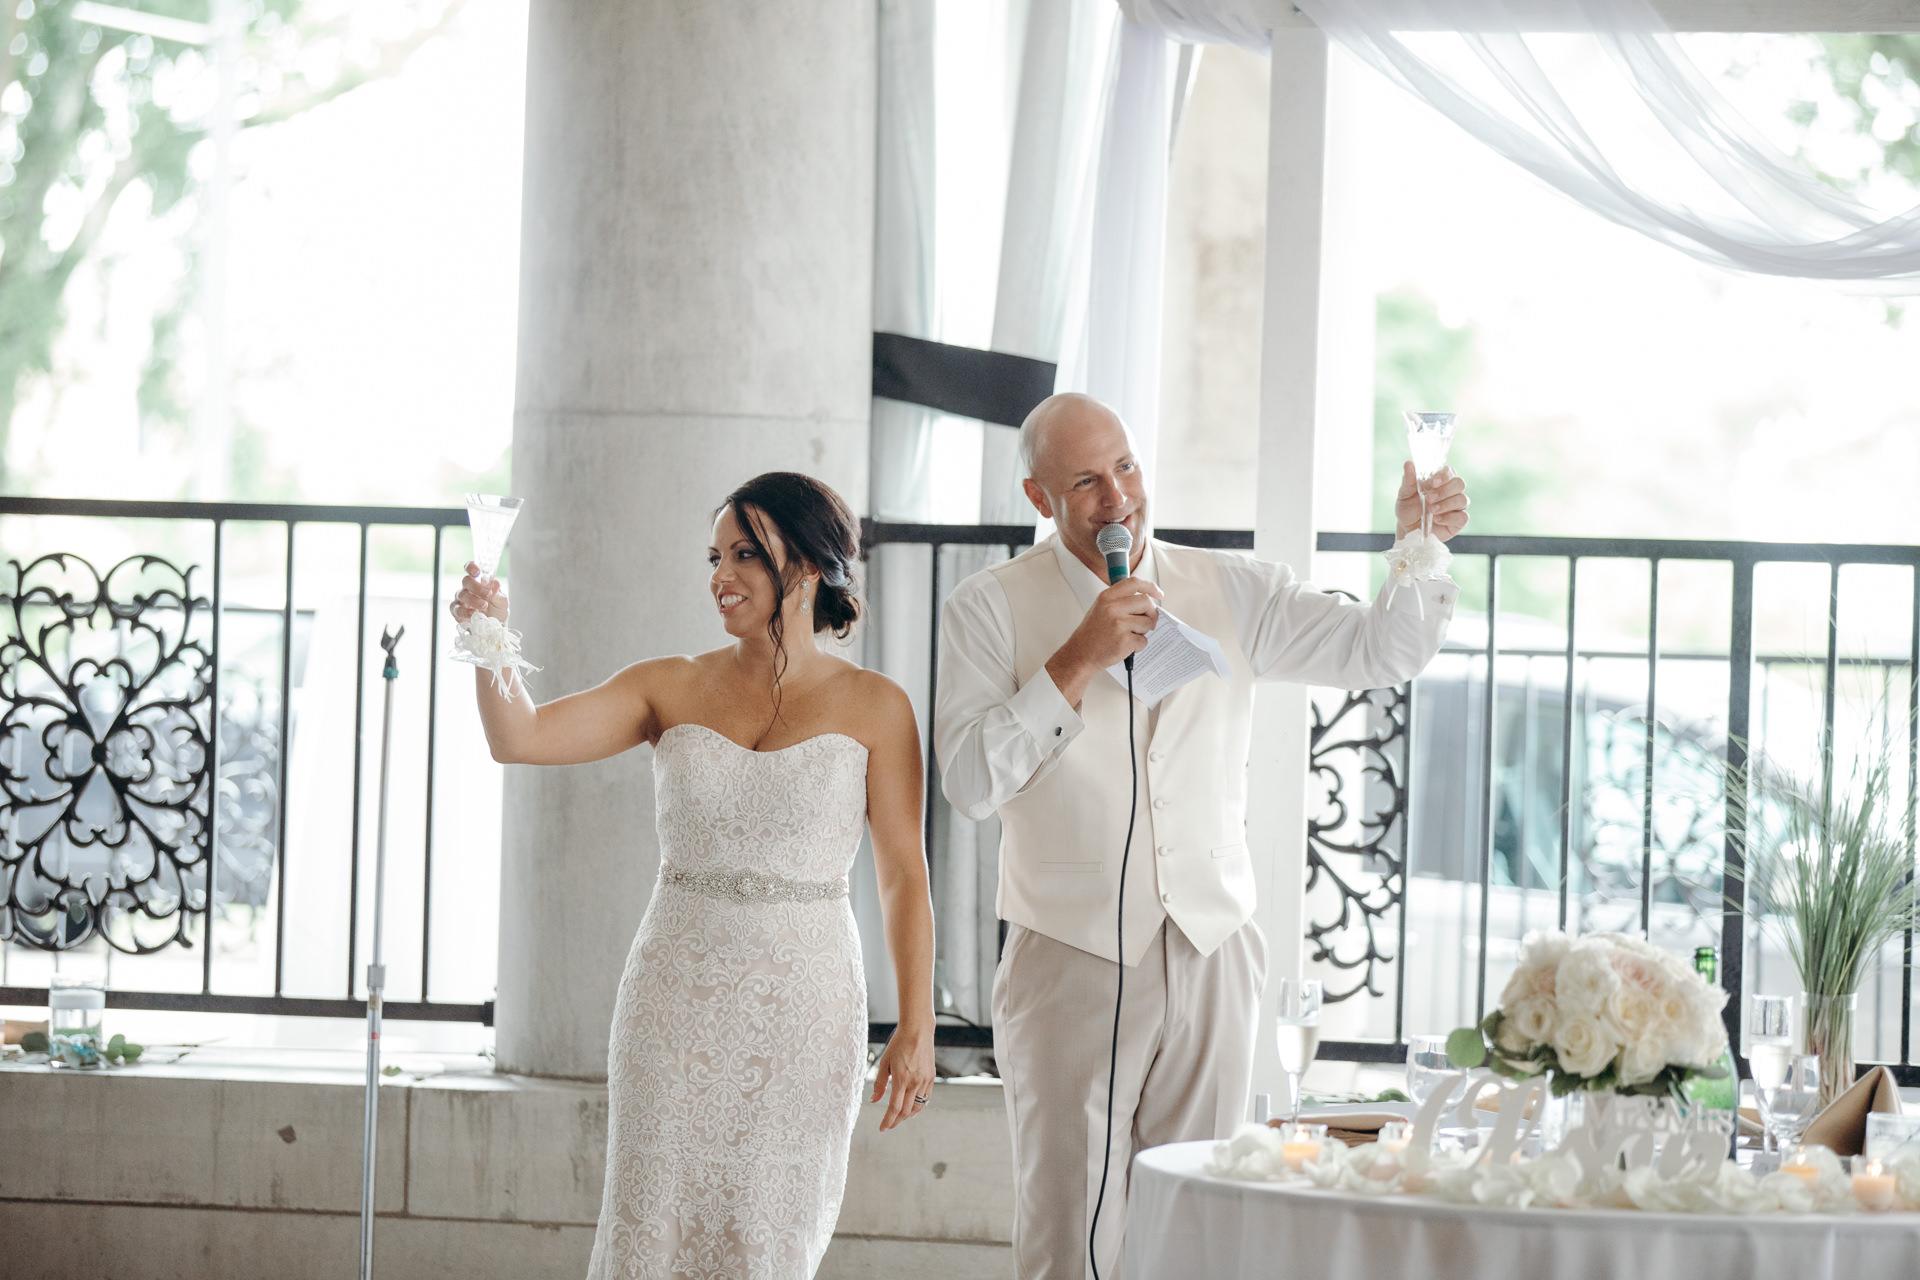 Grant Beachy Tammy Chris wedding photography goshen Saint Joseph veranda whitcomb-058.jpg